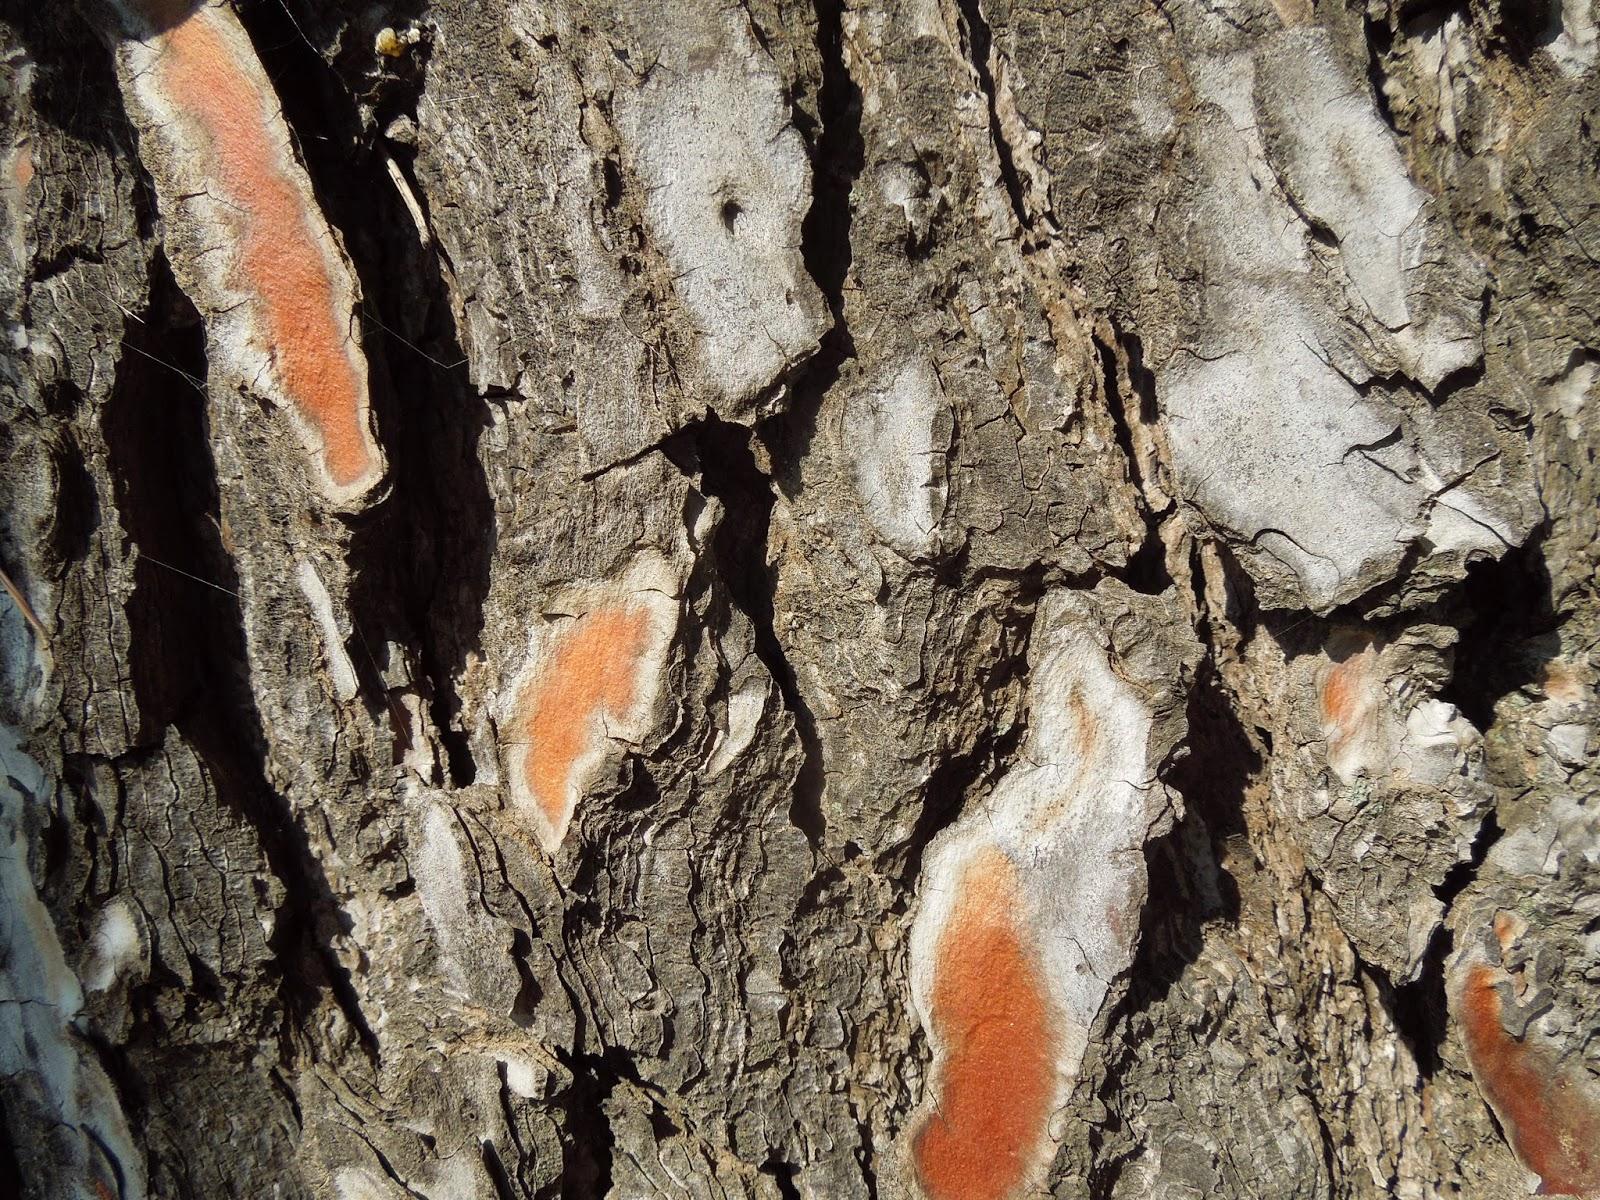 Corteza de pino montse fotoblog - Corteza de pino ...